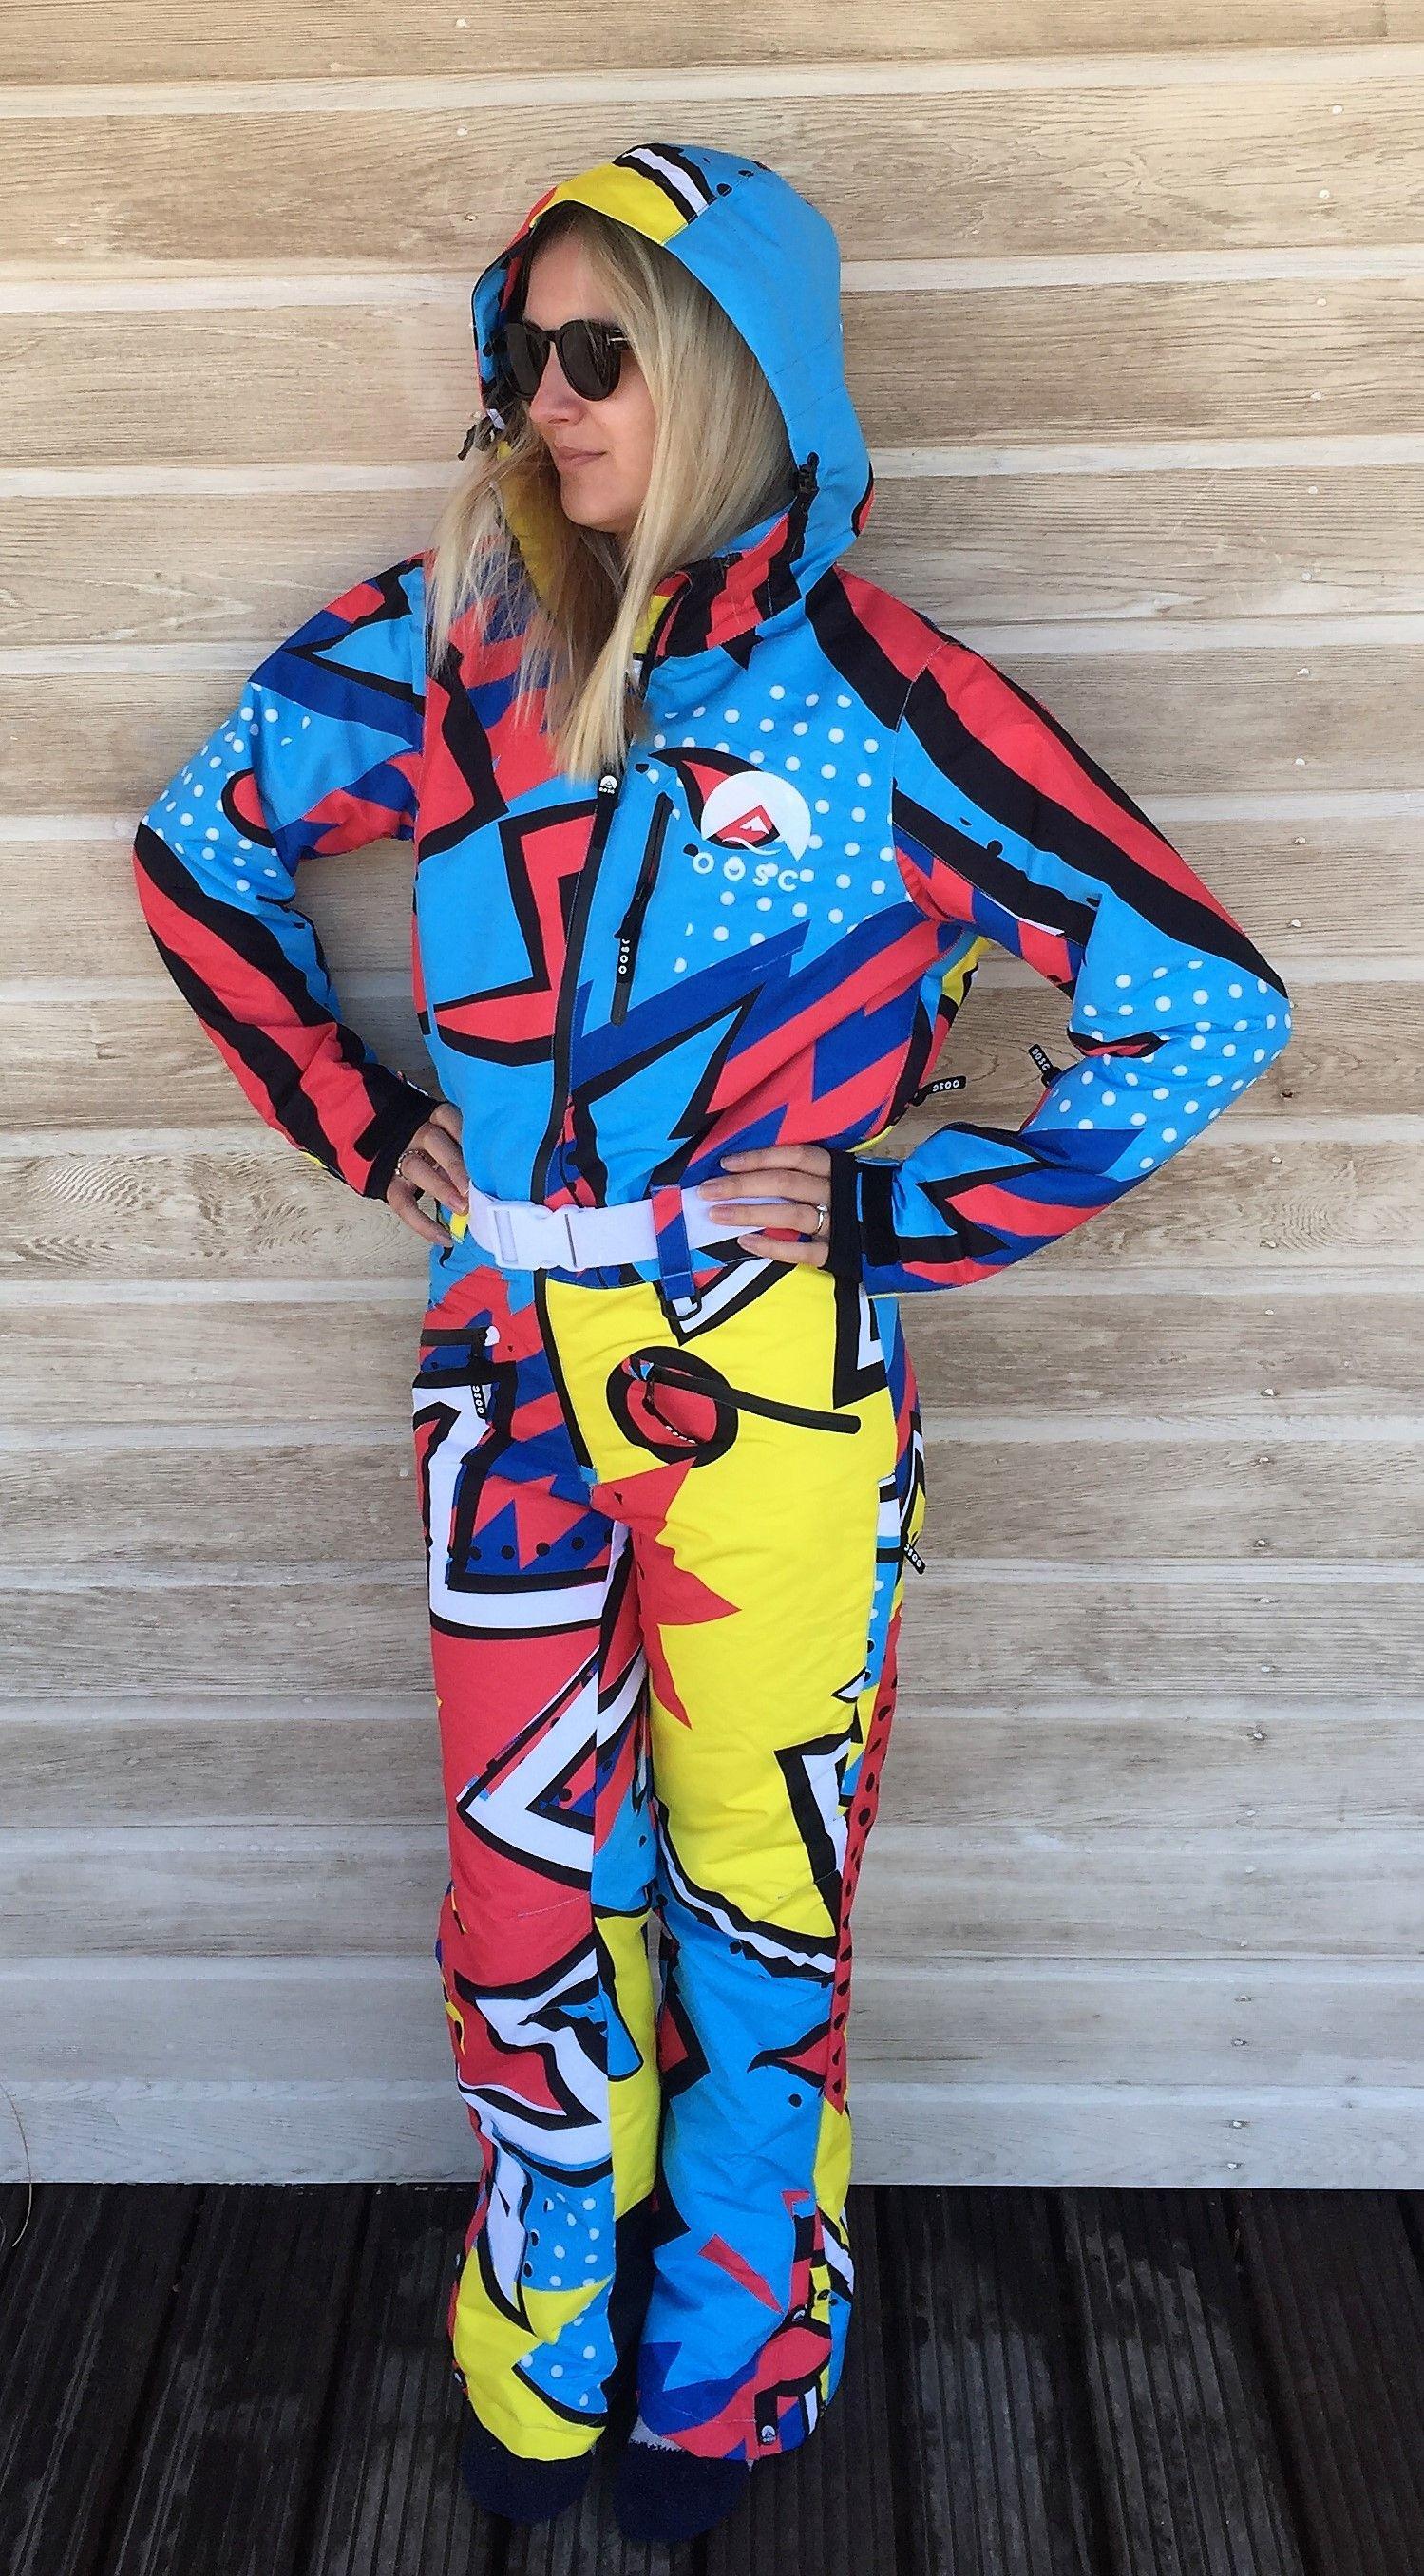 3ba8430cd0 Fresh Prince 2k18 - Women s Ski Suit - OOSC Clothing